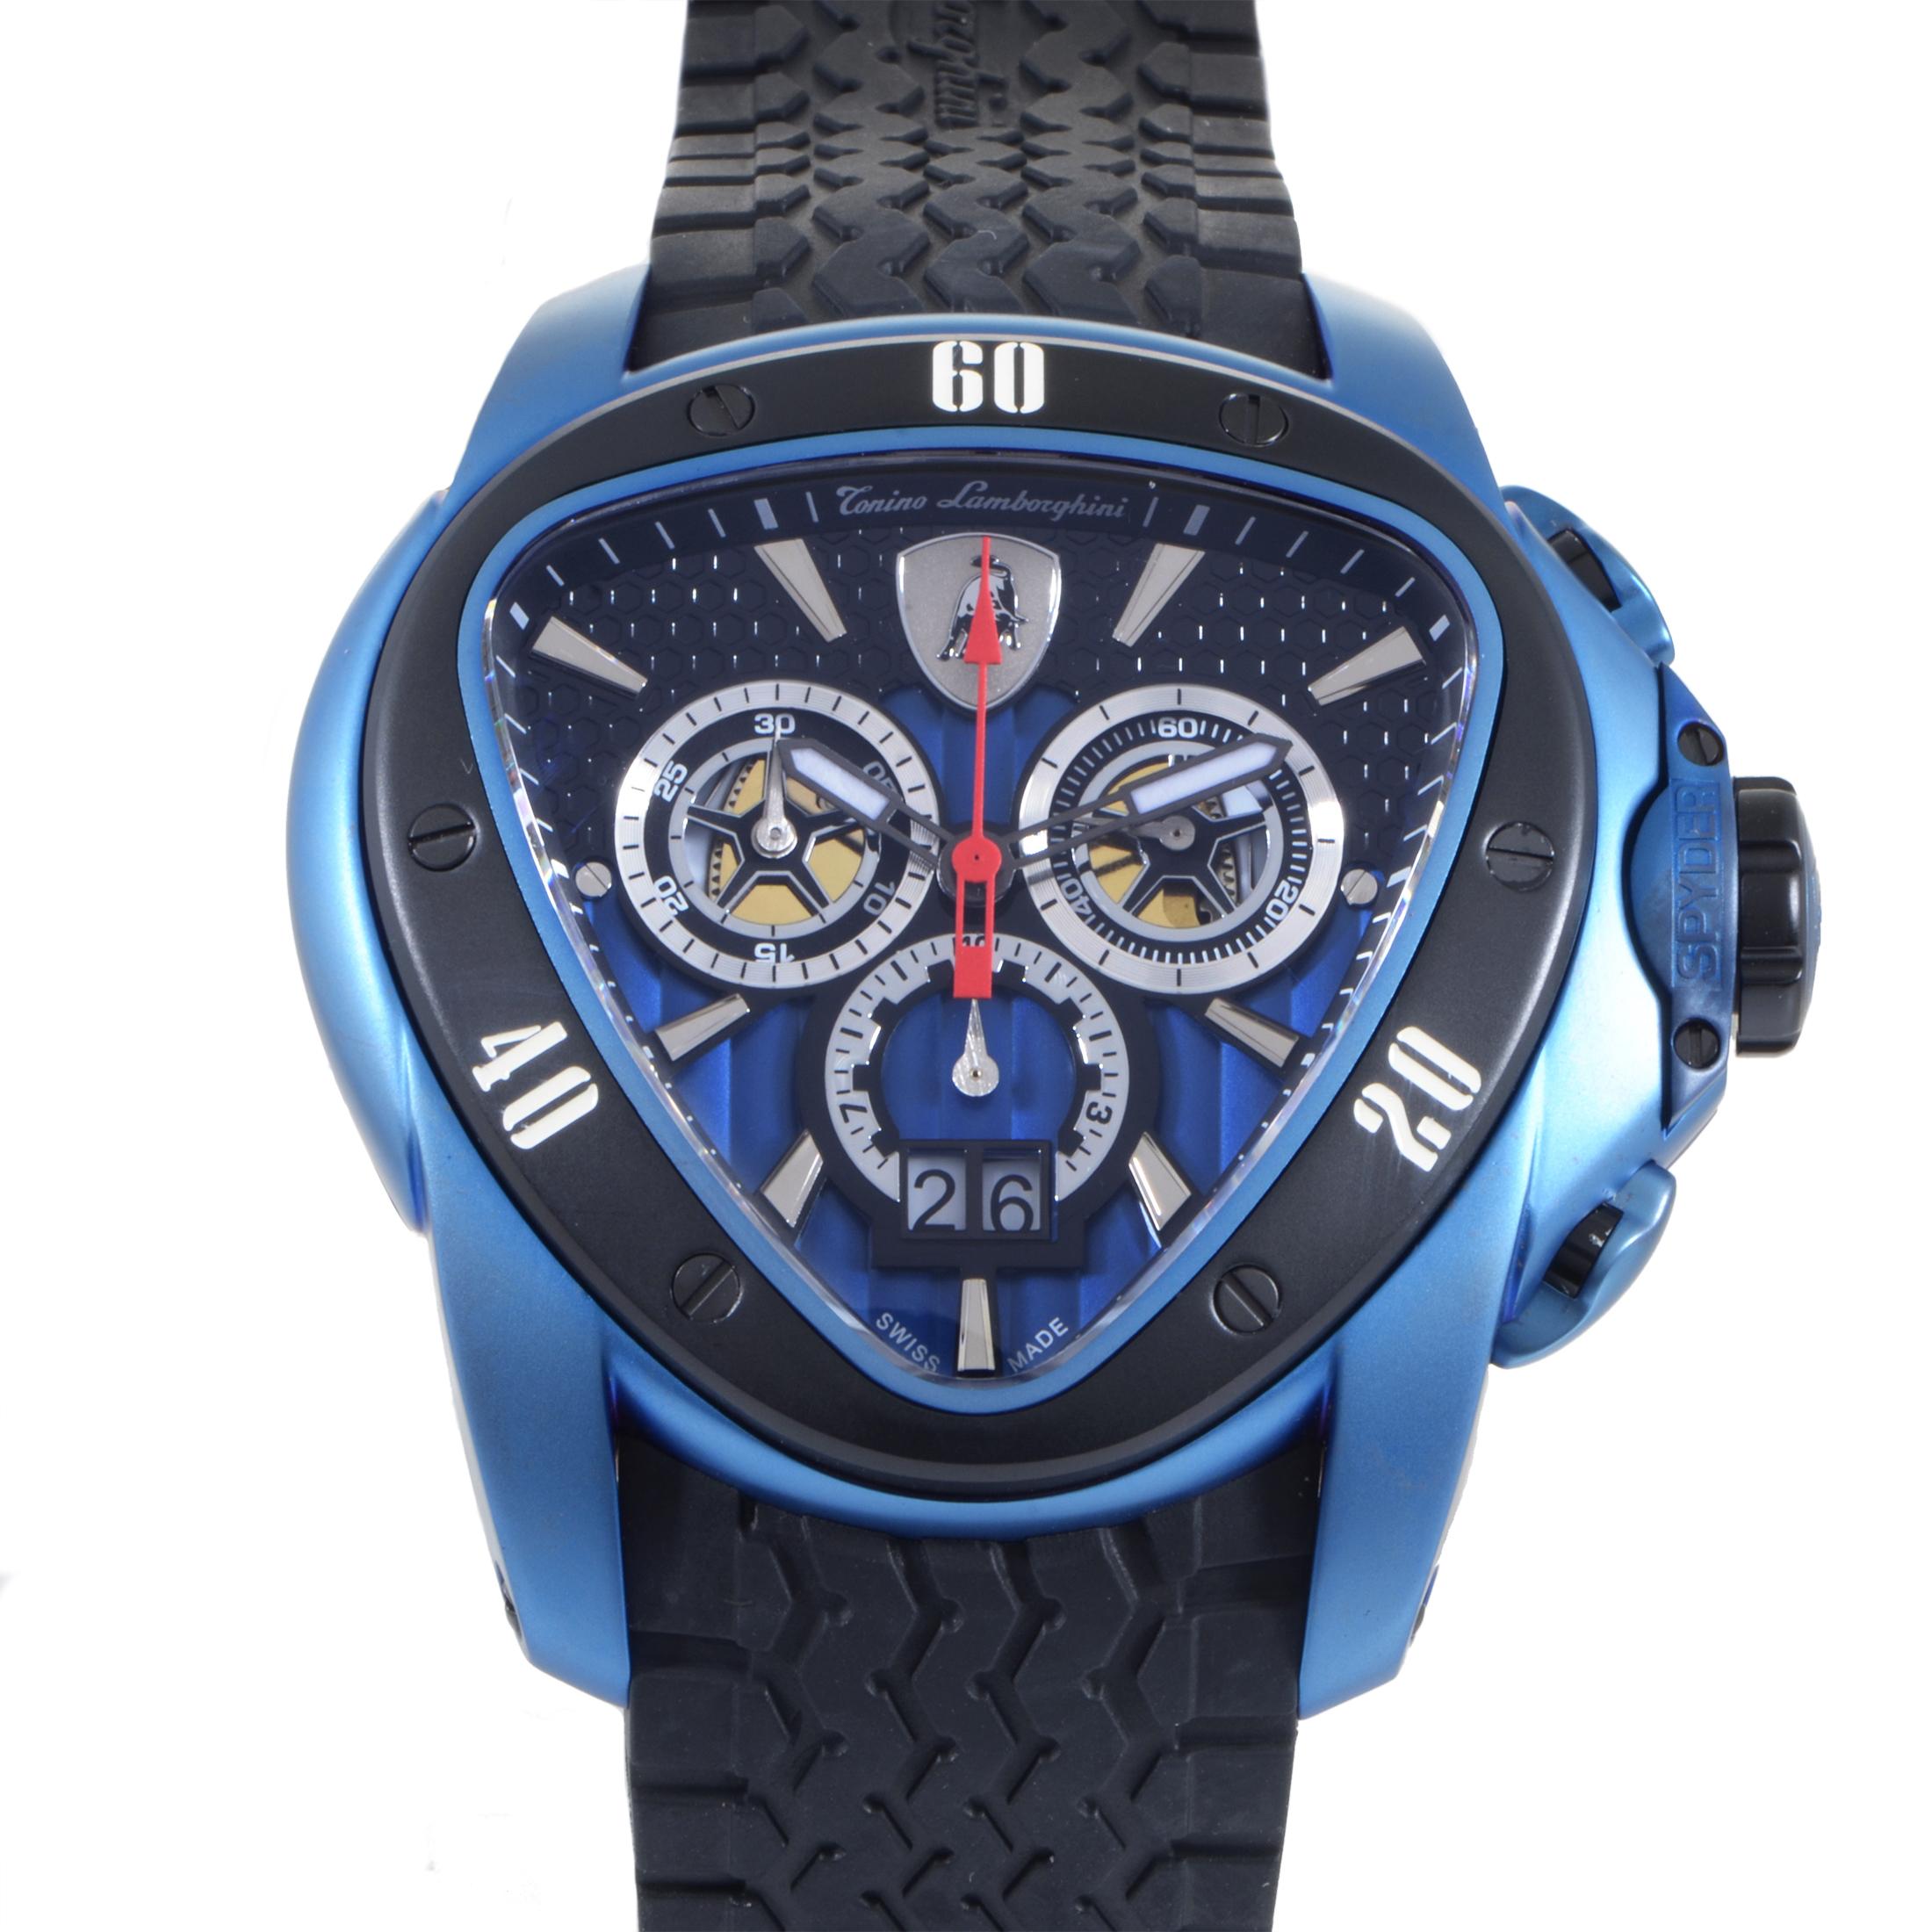 Spyder Men's Quartz Chronograph Watch 1100 1123